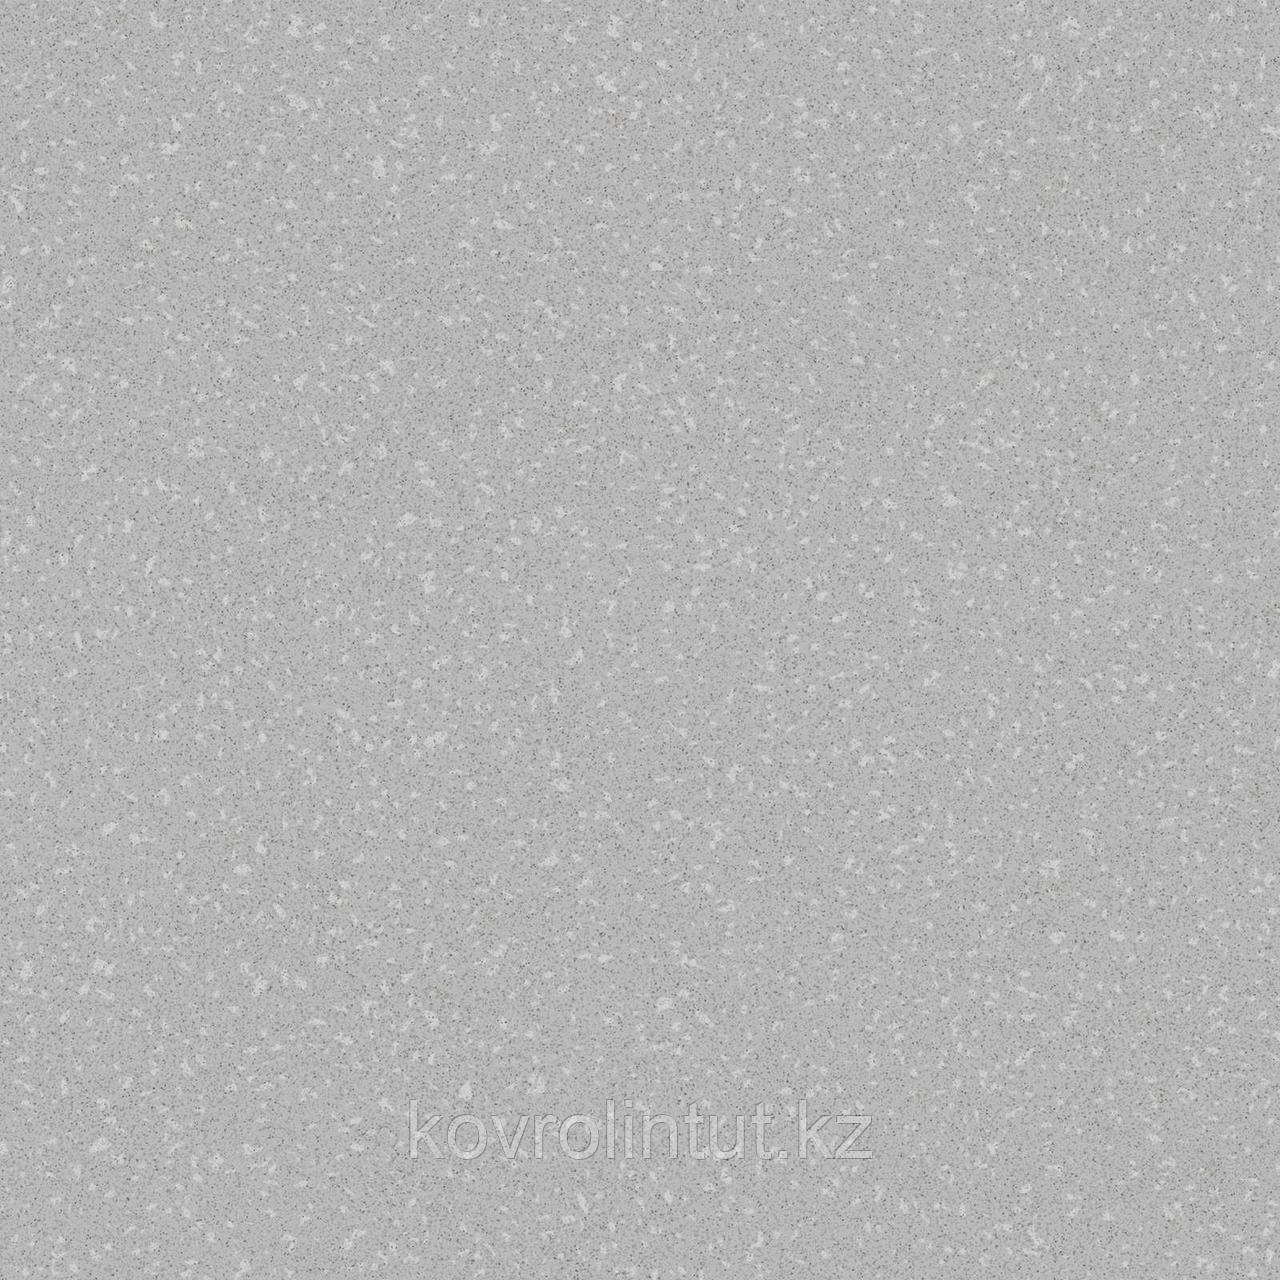 Линолеум коммерческий Acczent Pro Aspect 2 4,0 м